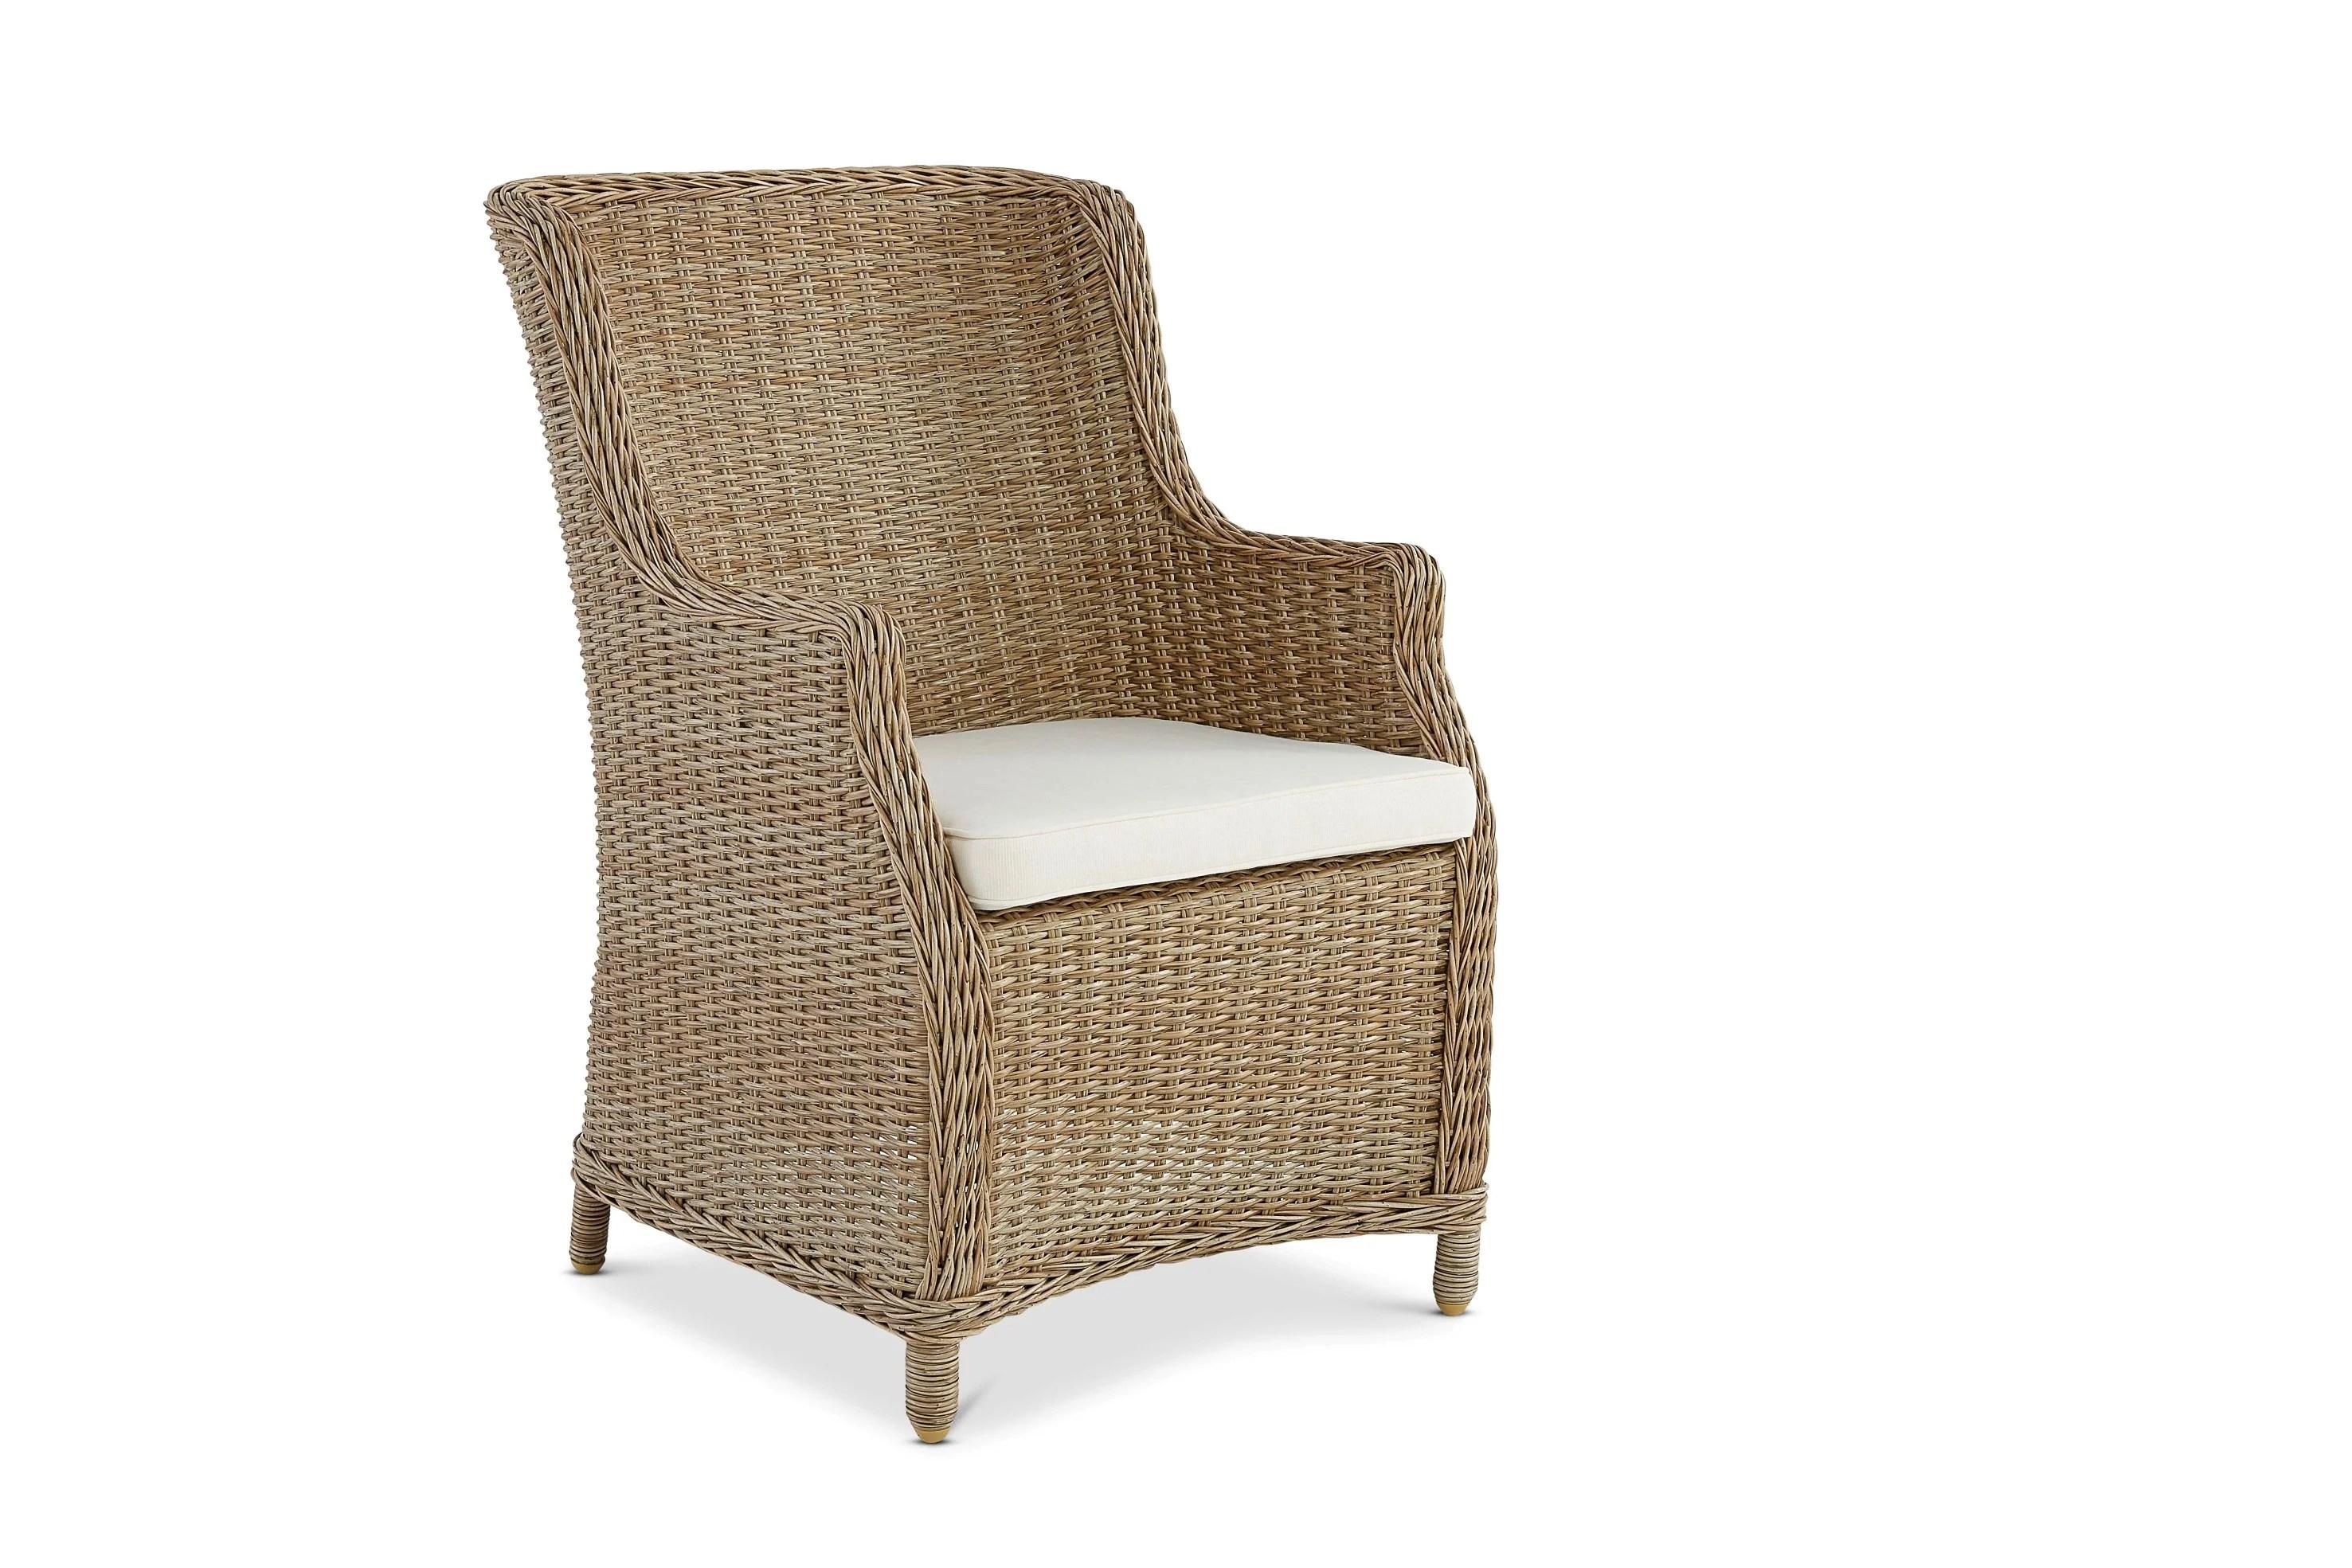 white outdoor dining chair australia bean bag filler kmart darwin wisteriadesign